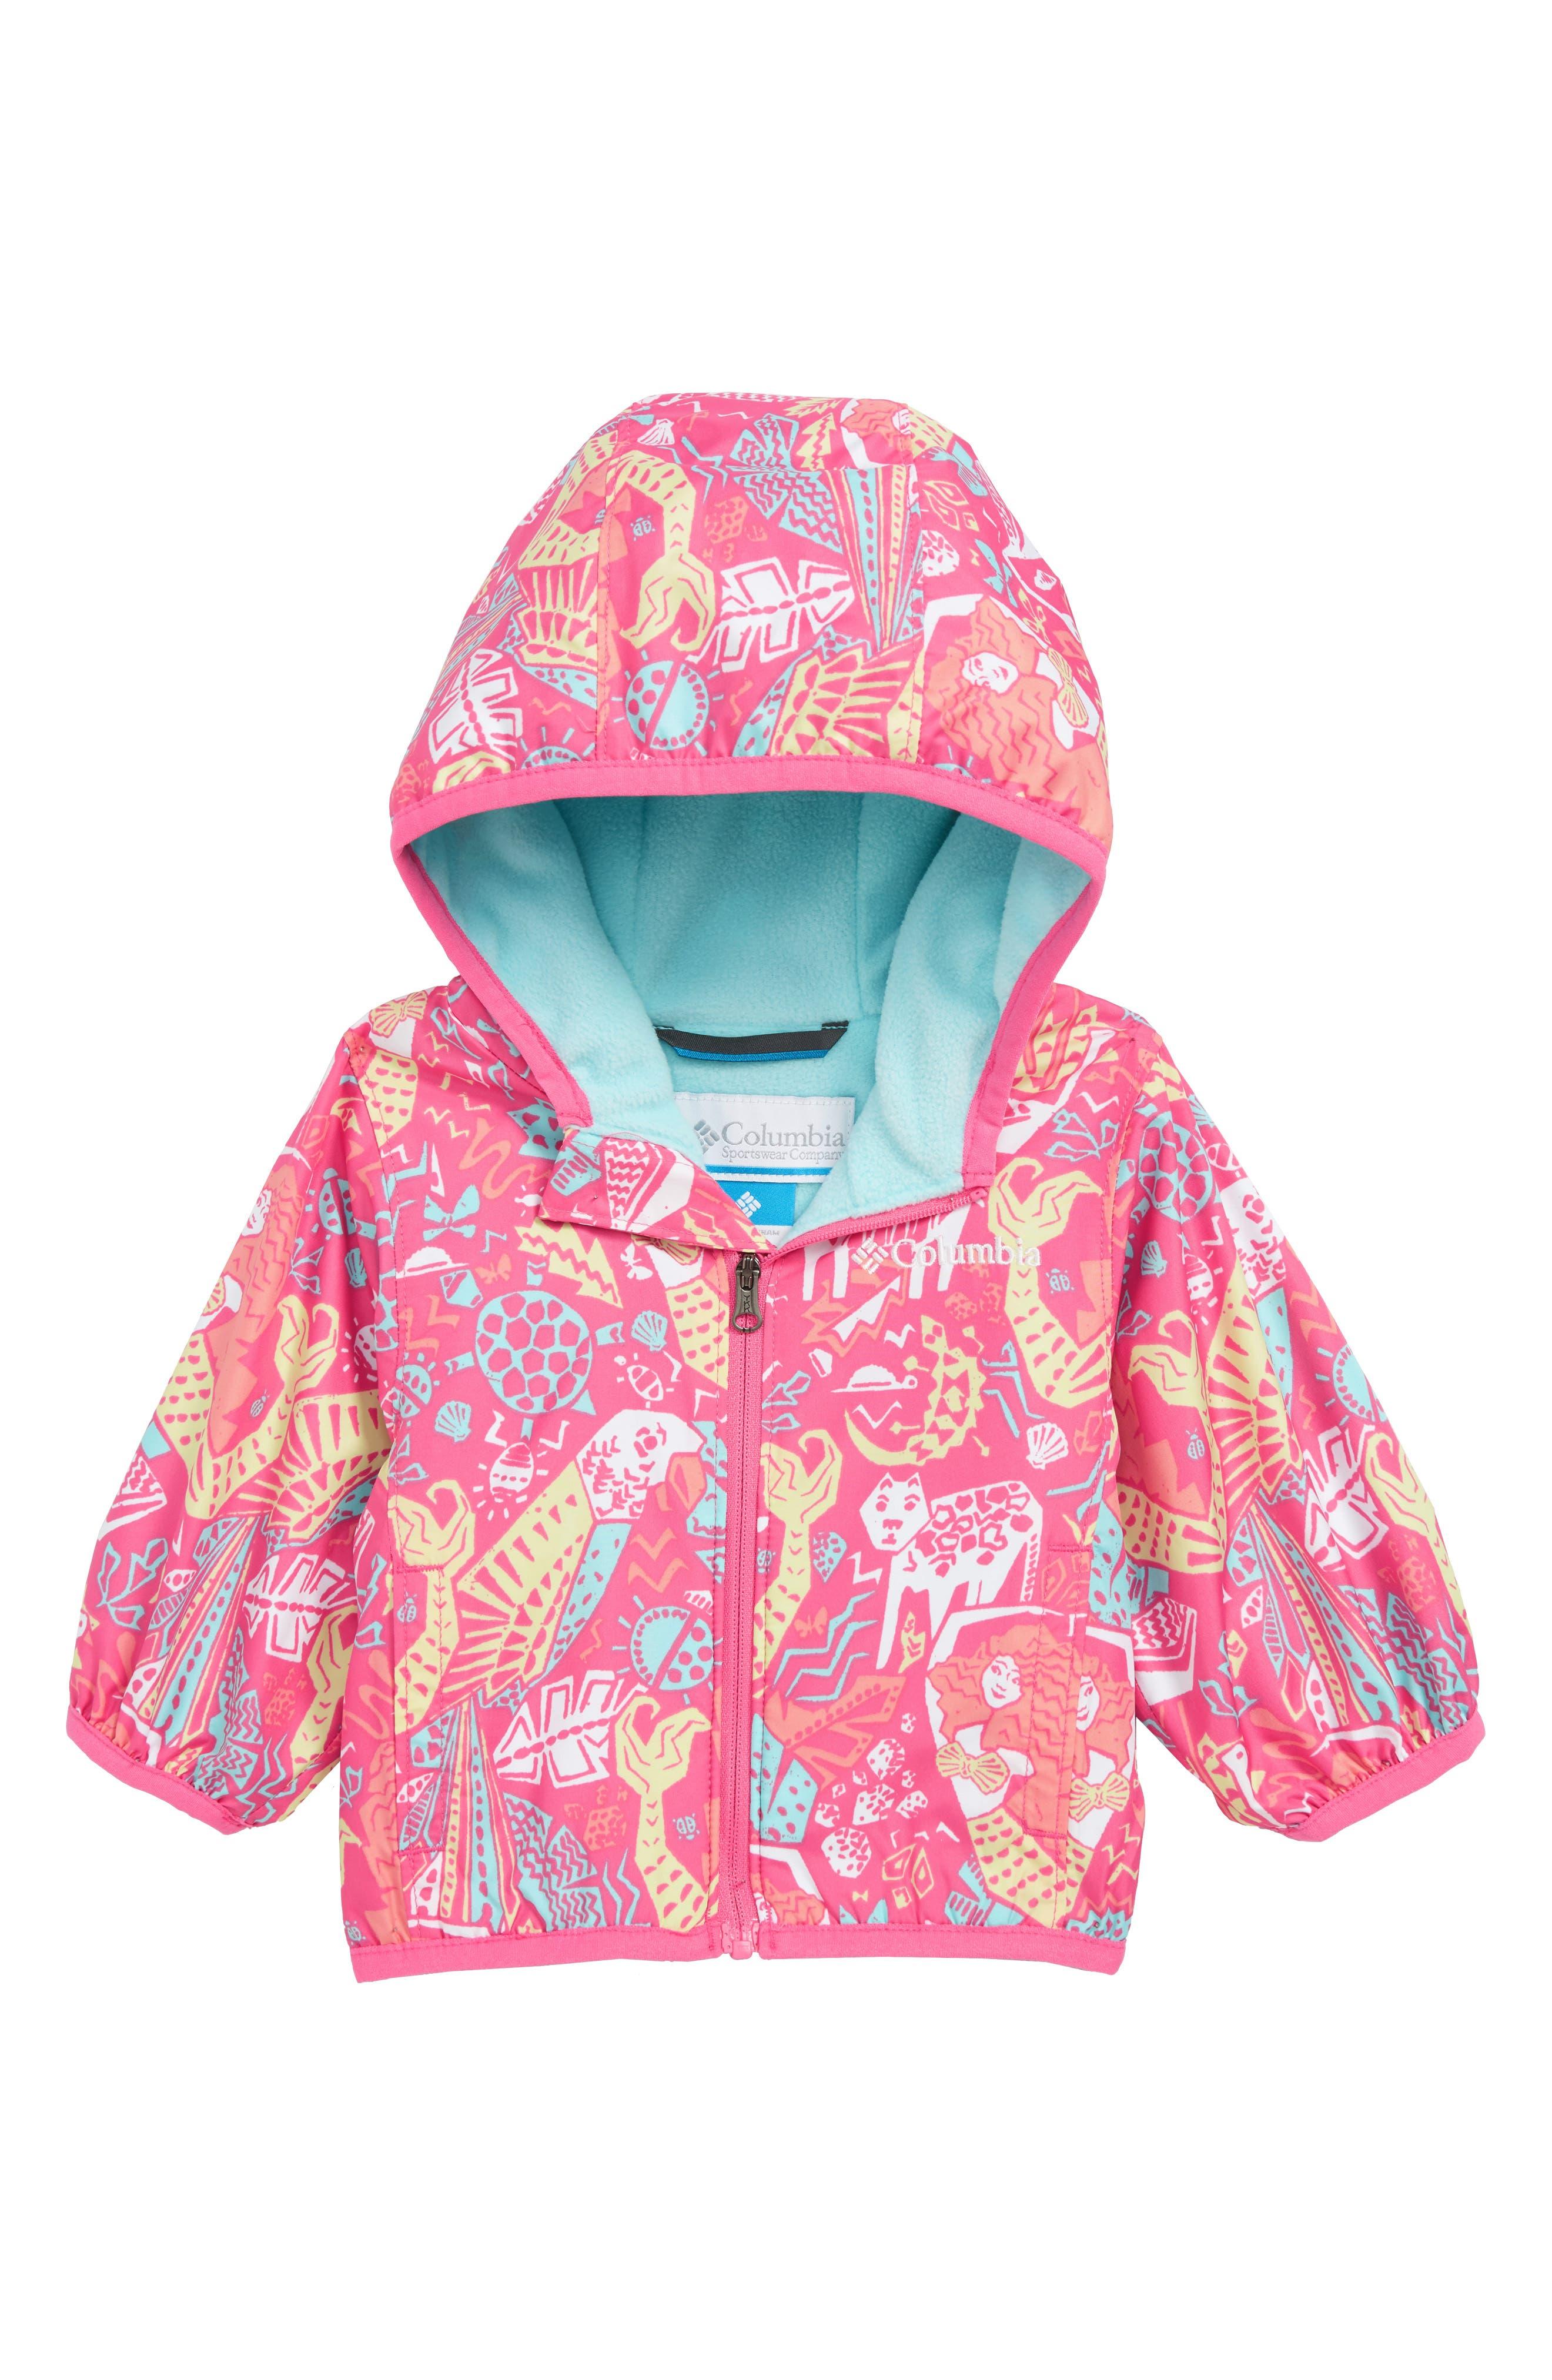 COLUMBIA,                             Mini Pixel Grabber<sup>™</sup> II Water Resistant Hooded Jacket,                             Main thumbnail 1, color,                             WILD GERANIUM MERMAID JUNGLE